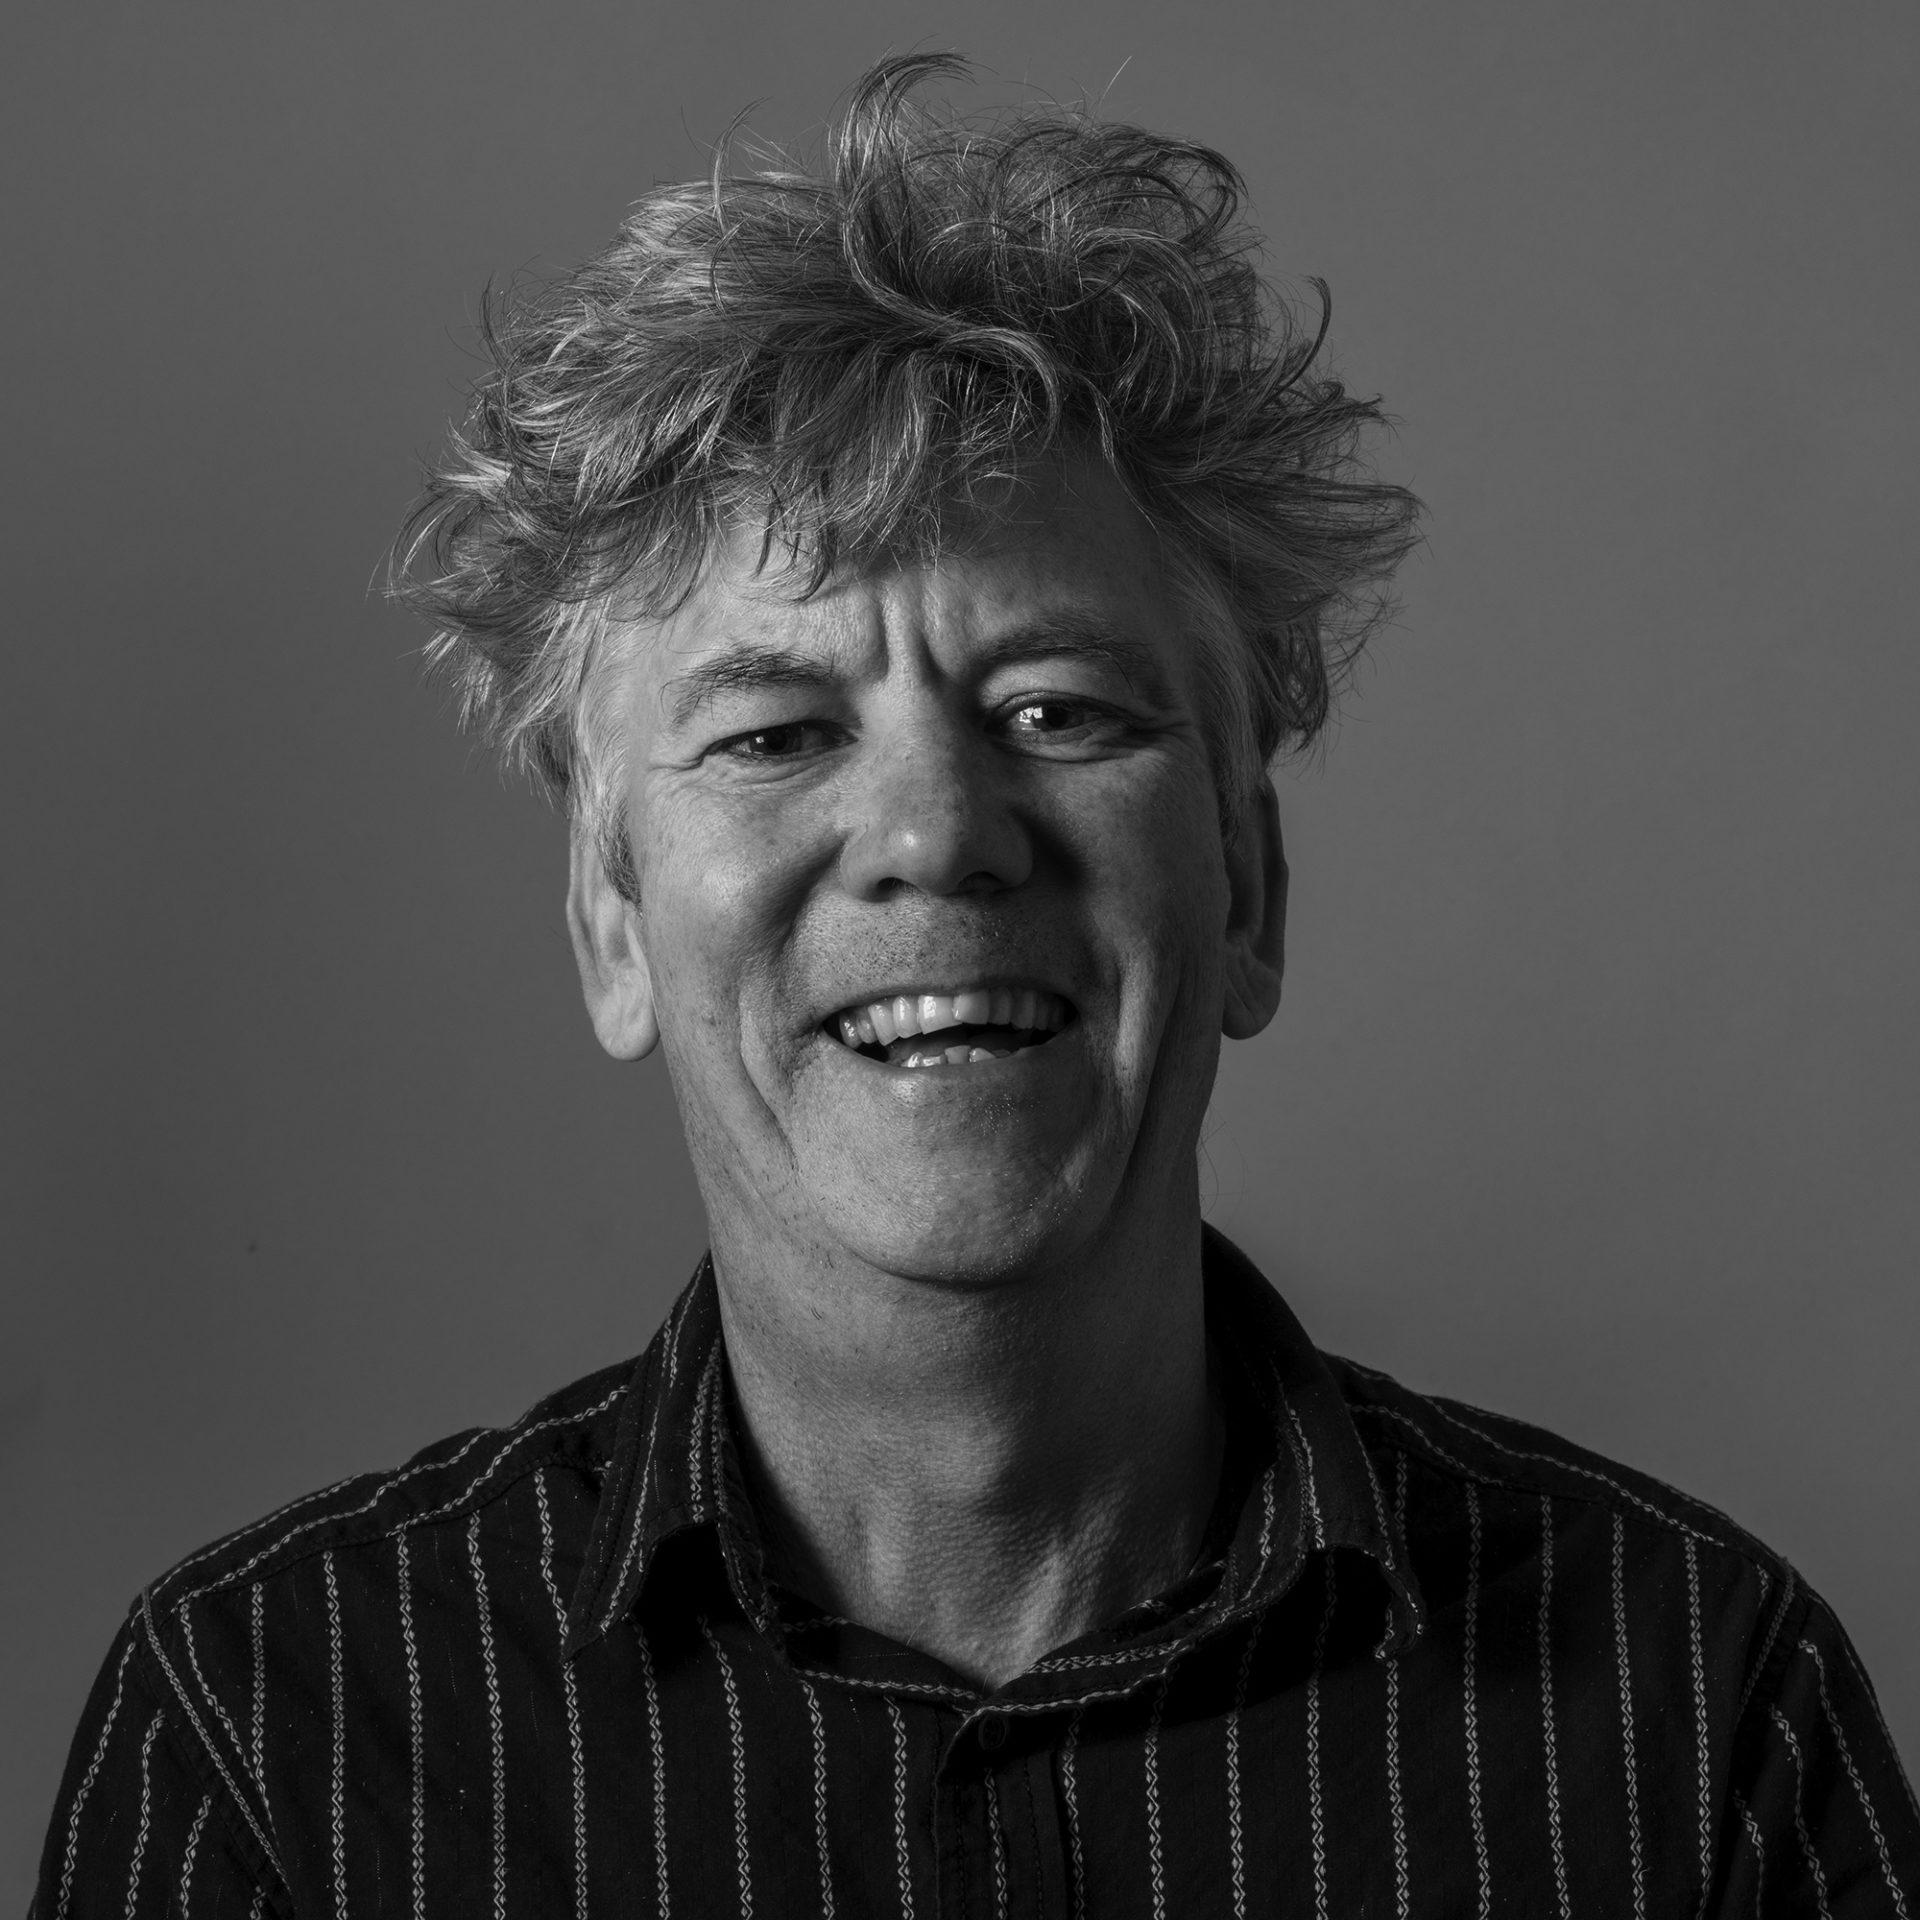 Dave Green smiling headshot